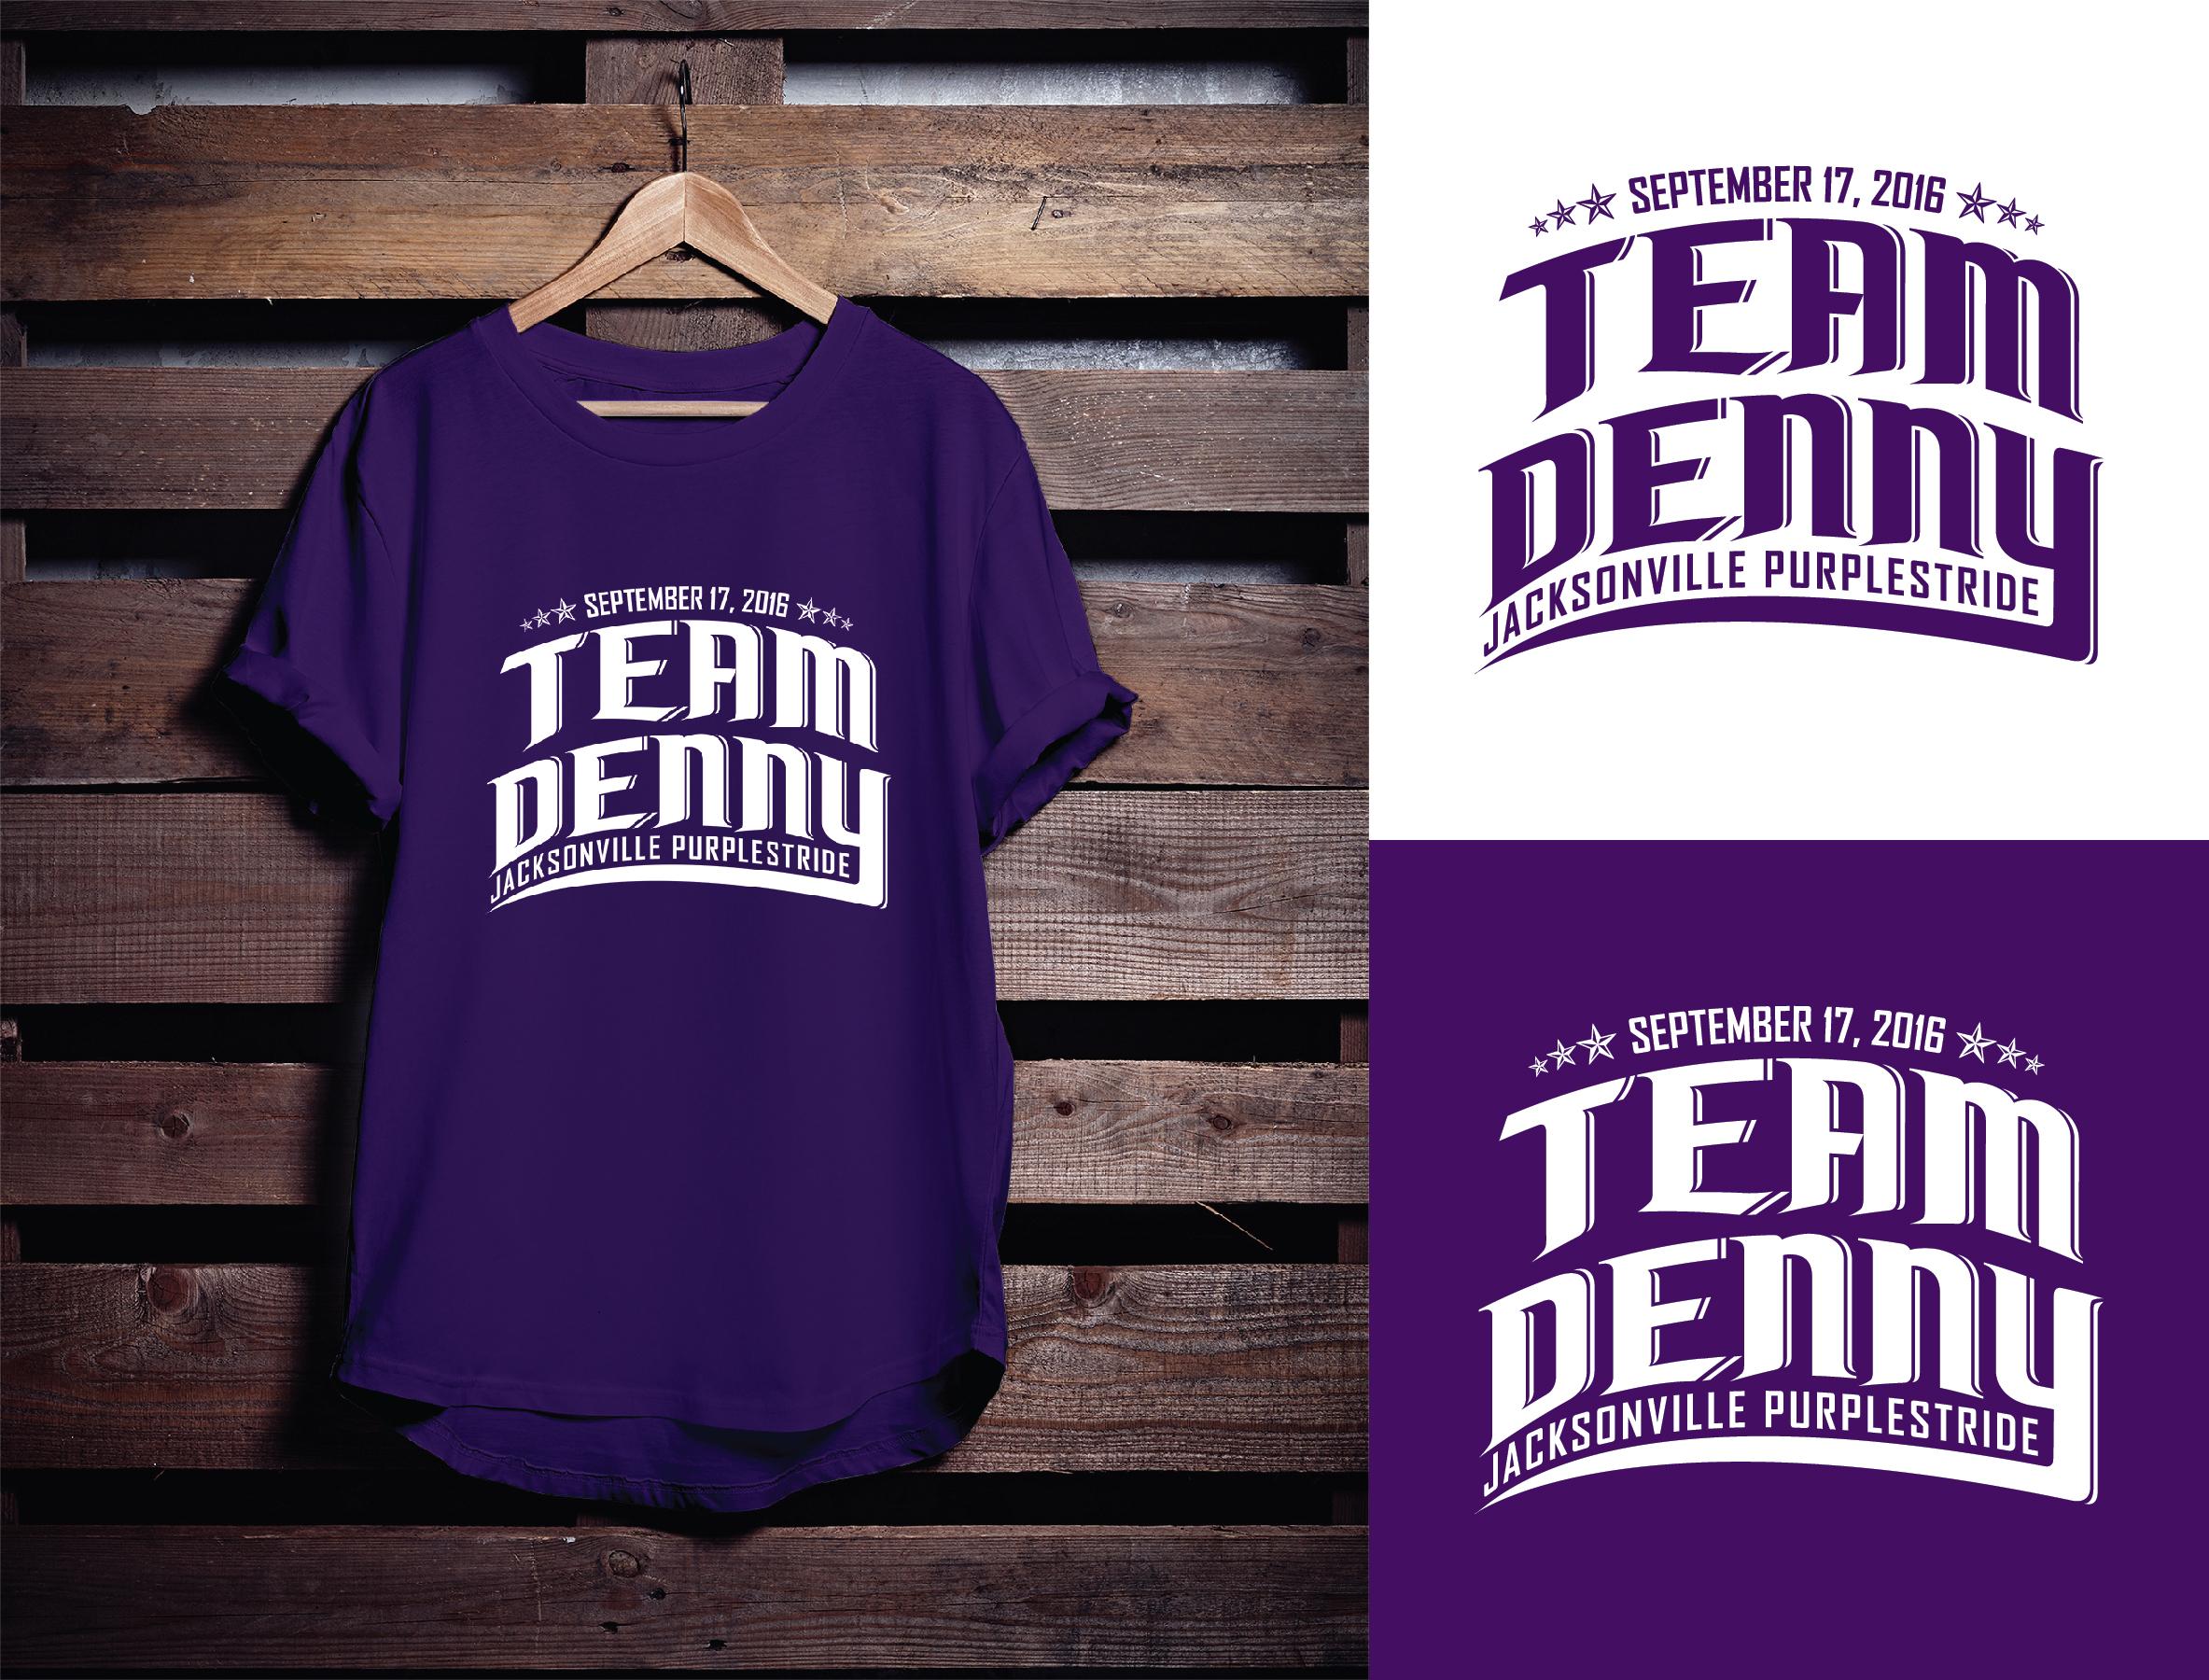 Logo Design by Shahab Uddin - Entry No. 22 in the Logo Design Contest  Logo Design for Team Denny front t shirt.